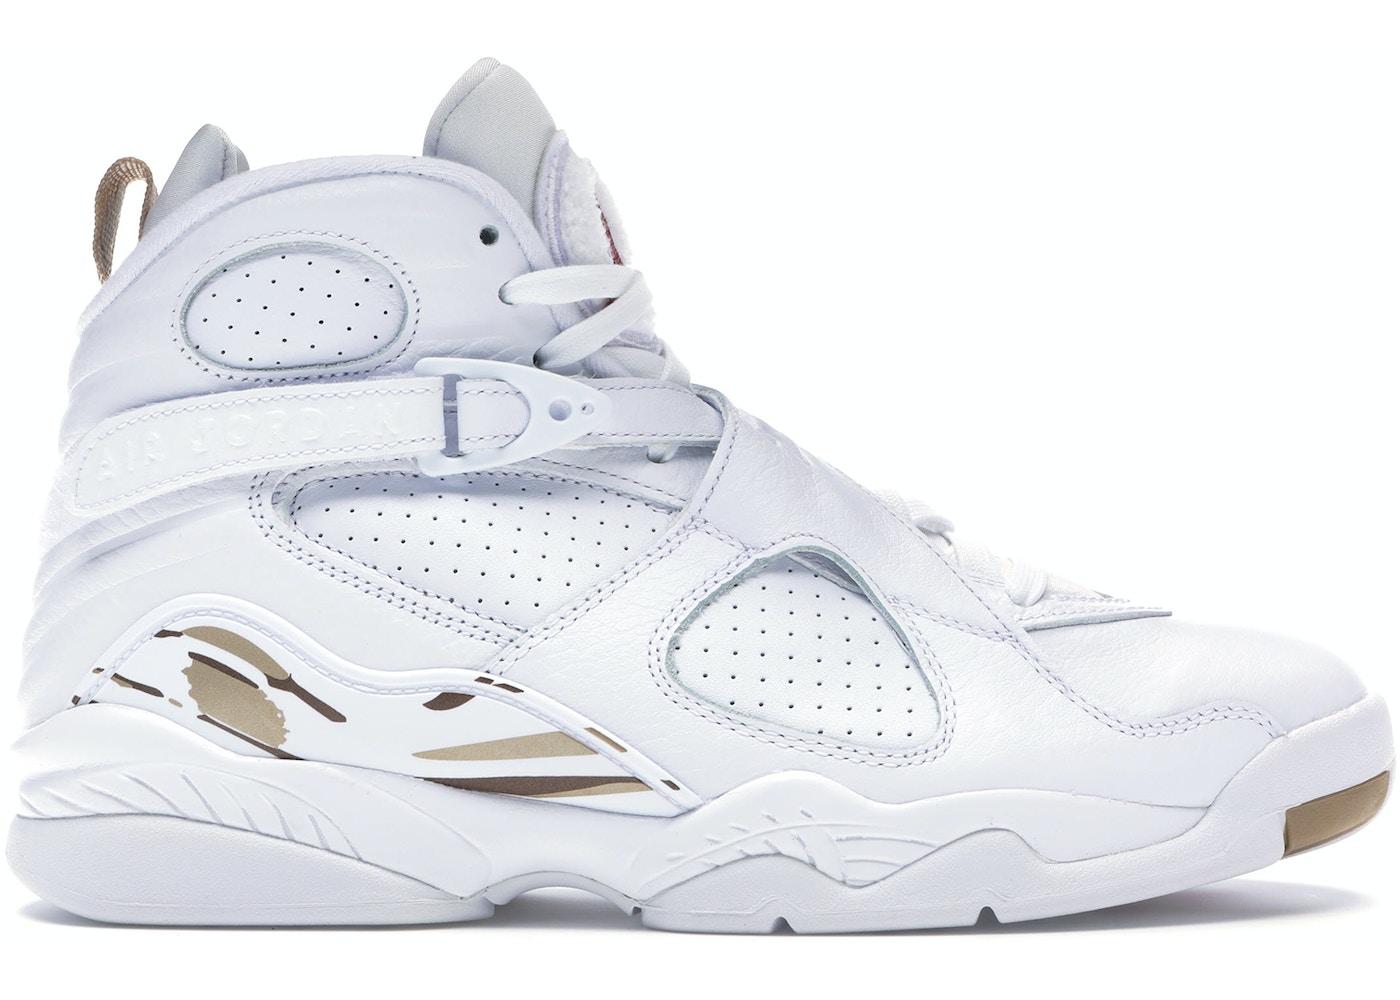 los angeles e55bc 236de Buy Air Jordan 8 Shoes & Deadstock Sneakers